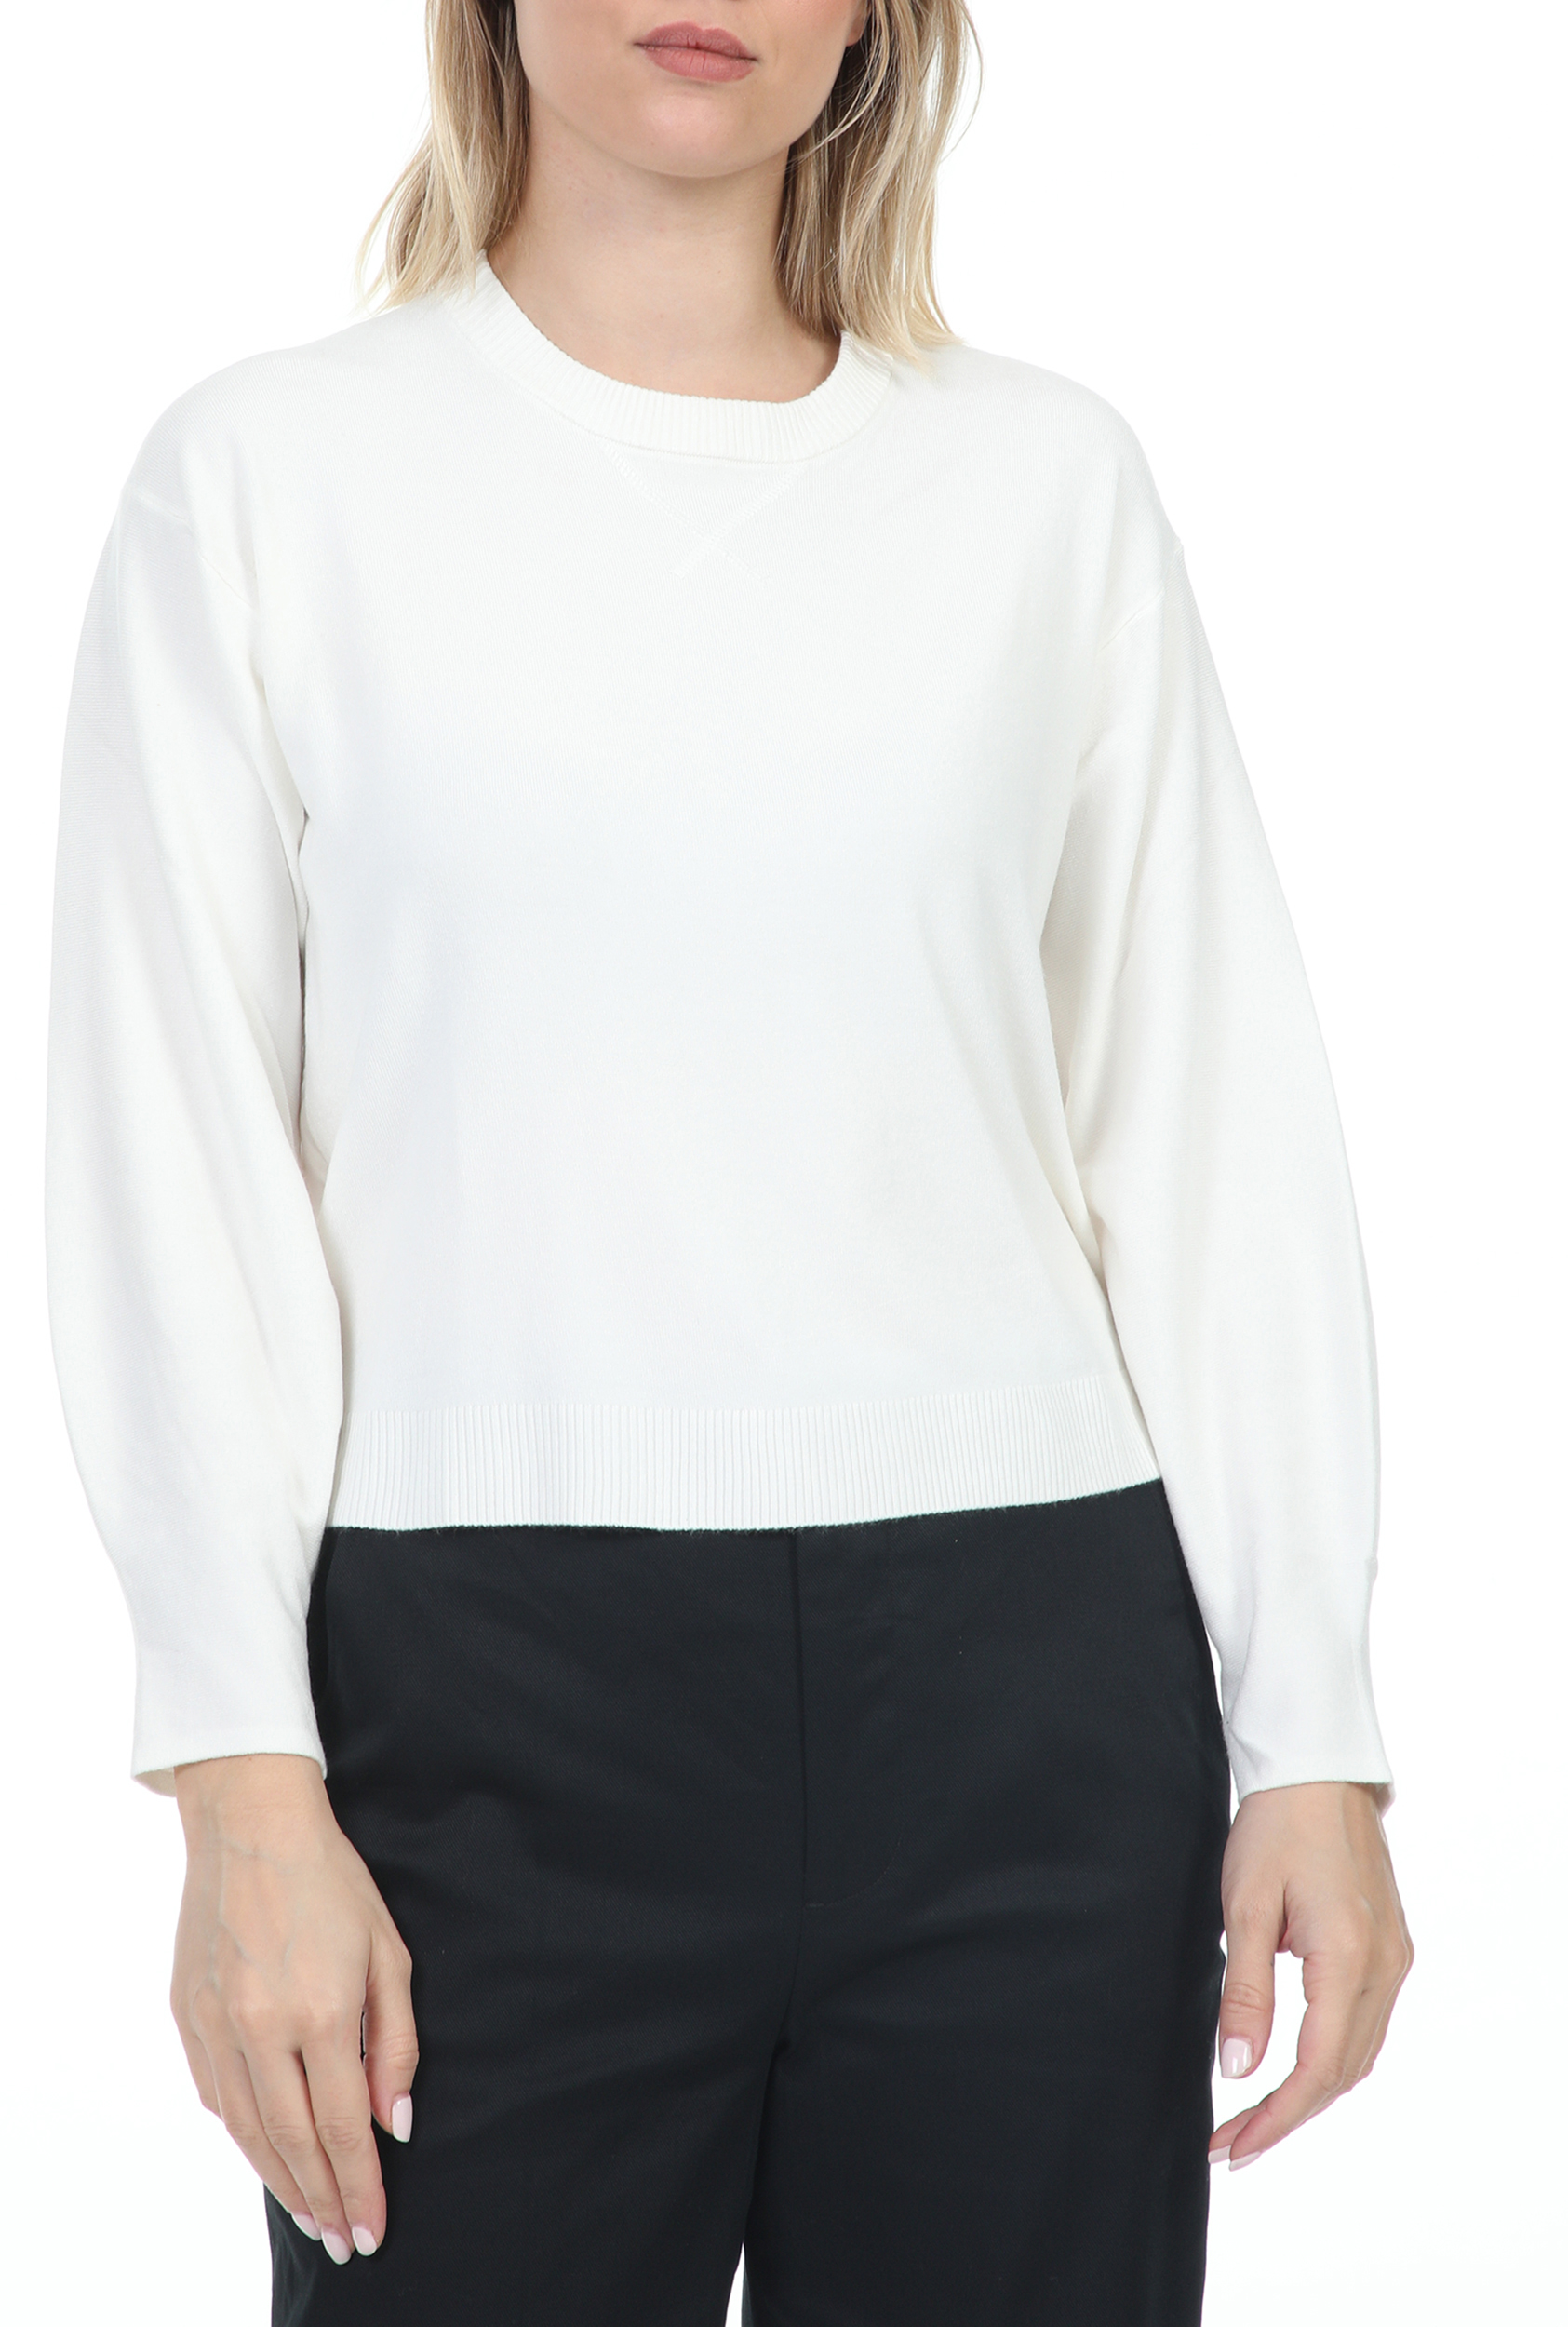 GUESS - Γυναικεία μπλούζα GUESS FILOMENA LS SWTR - FULL NEEDL λευκή